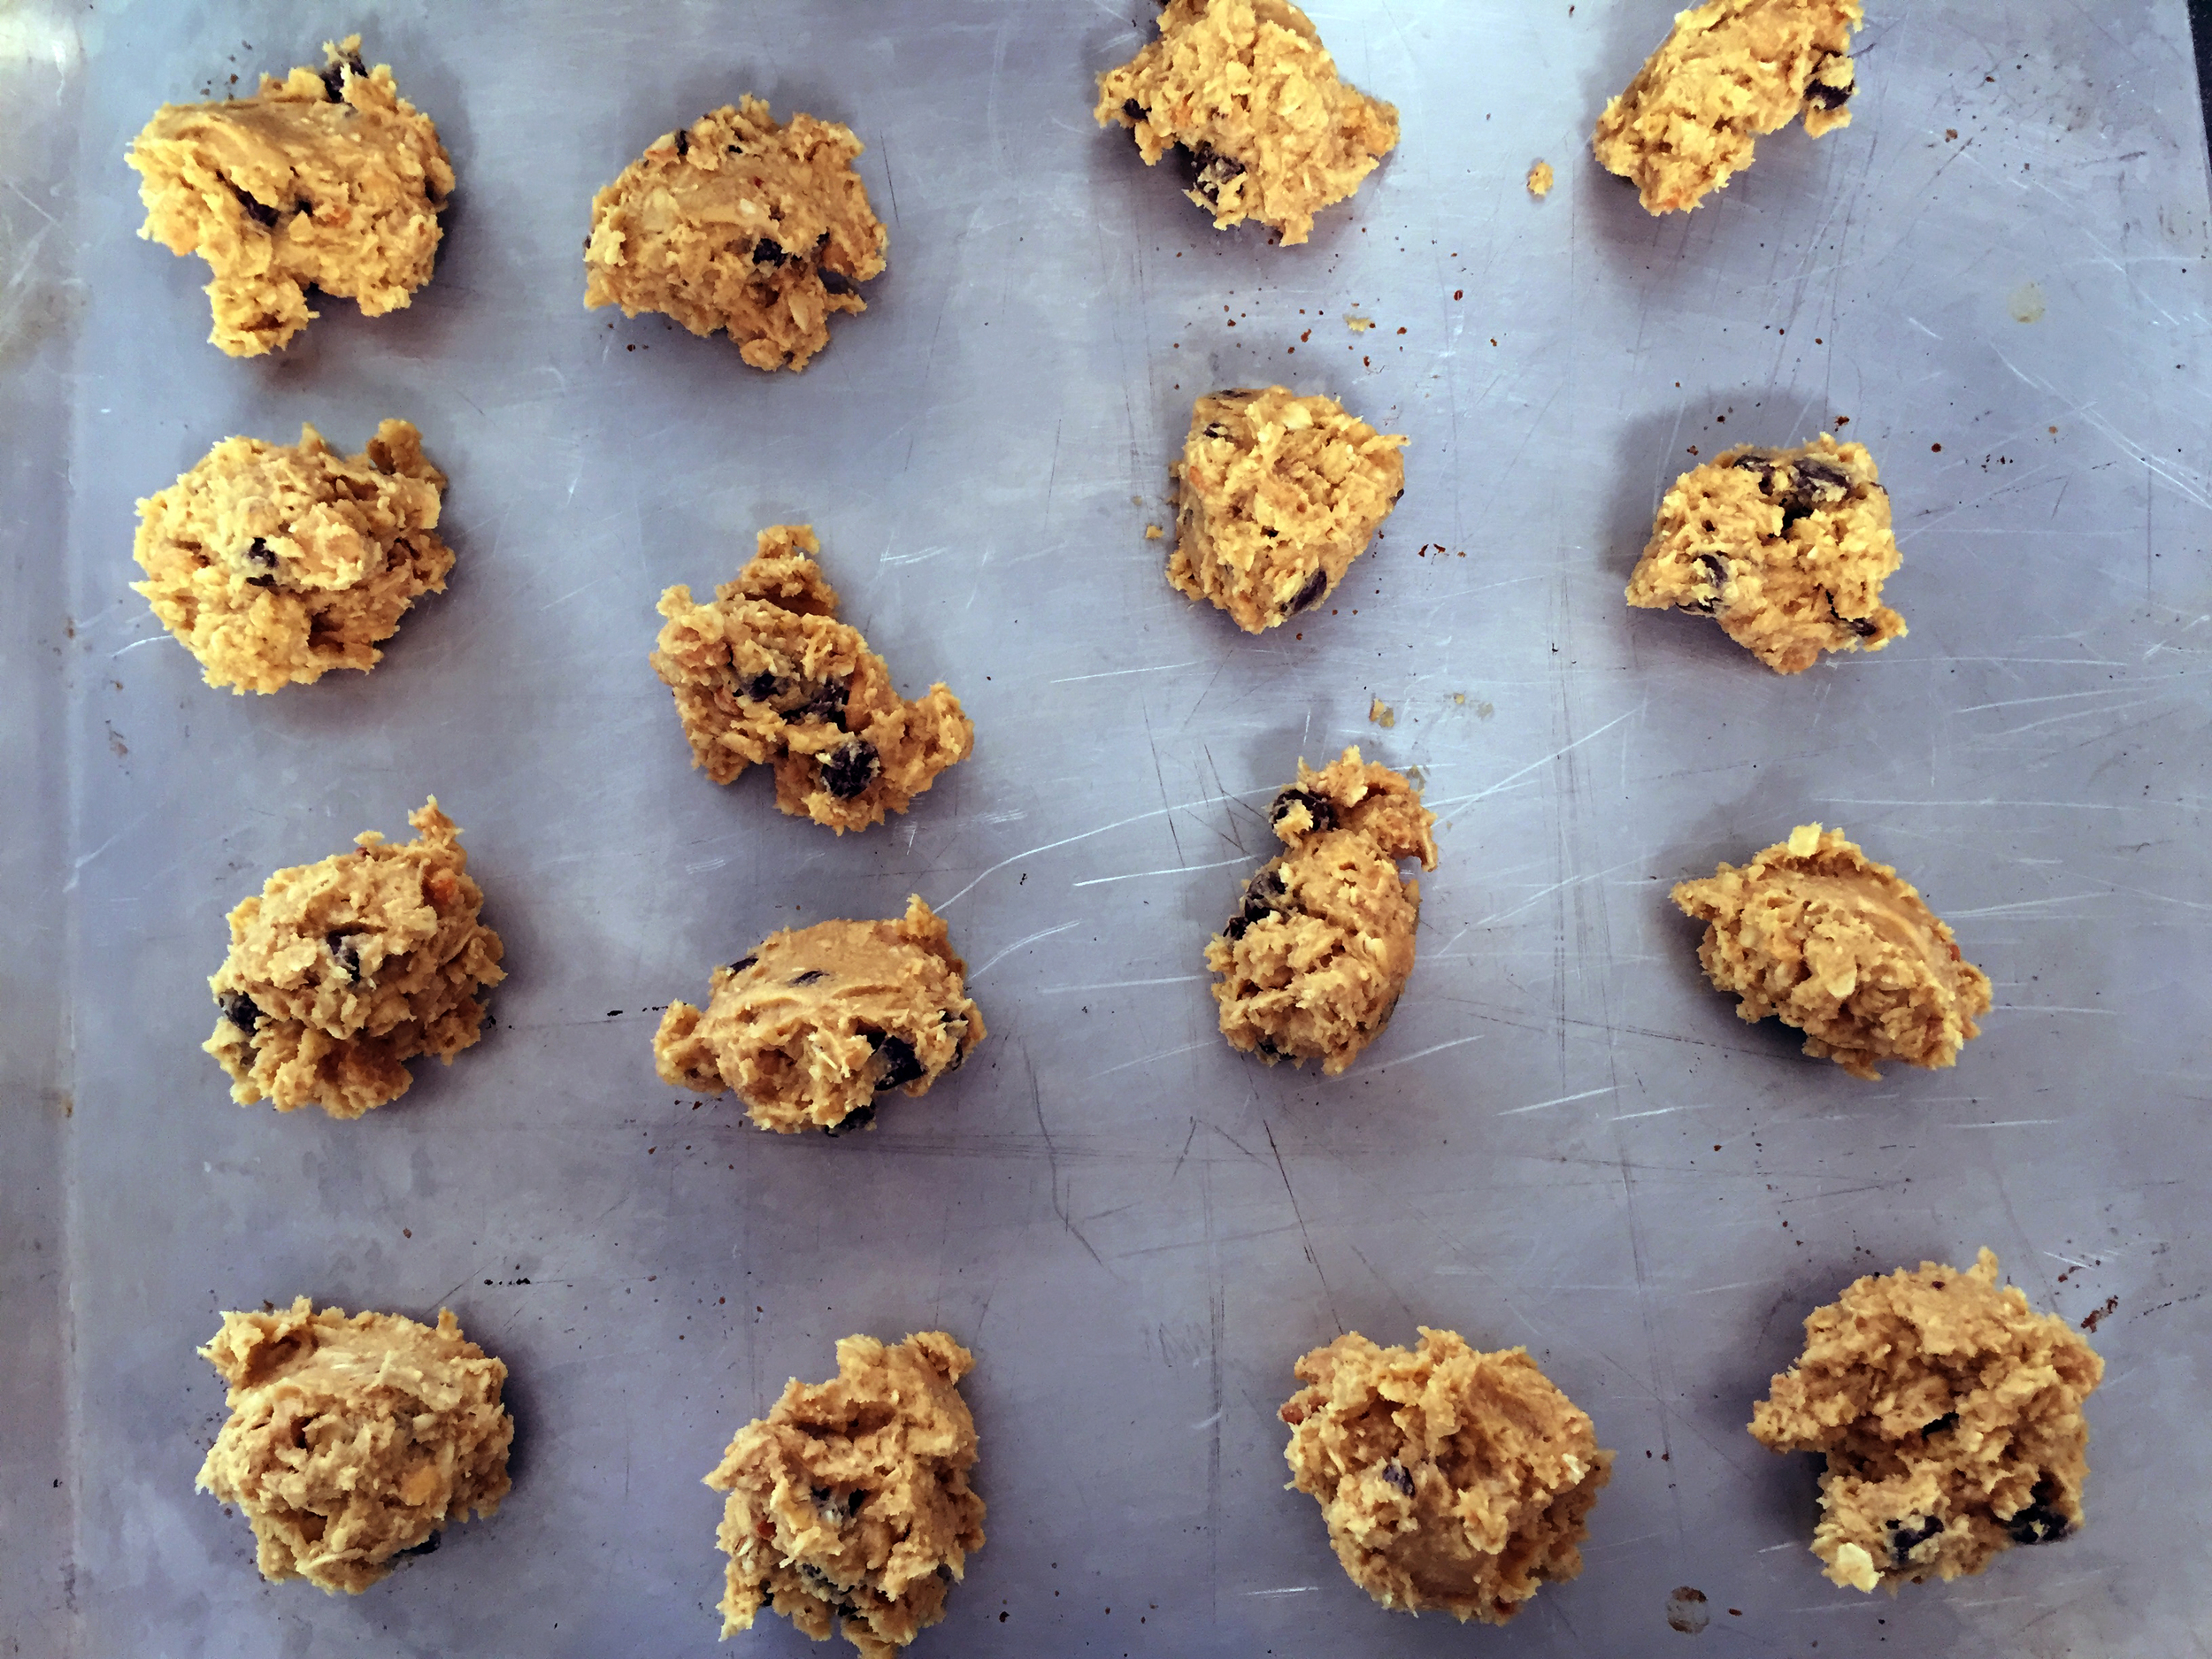 cookietray.jpg